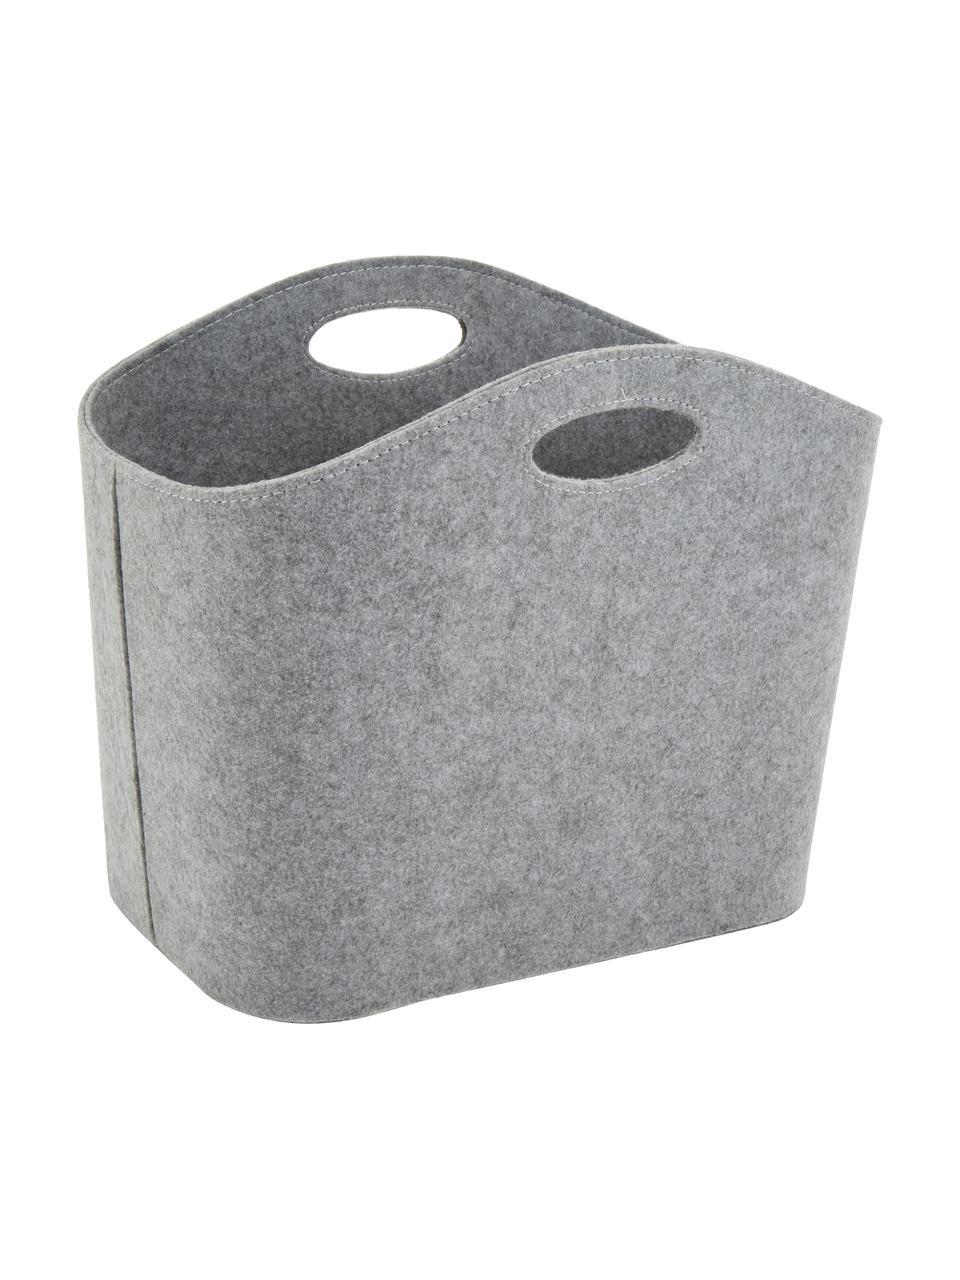 Cesta Mascha, Fieltro hecho de plástico reciclado, Gris, L 45 x An 30 cm